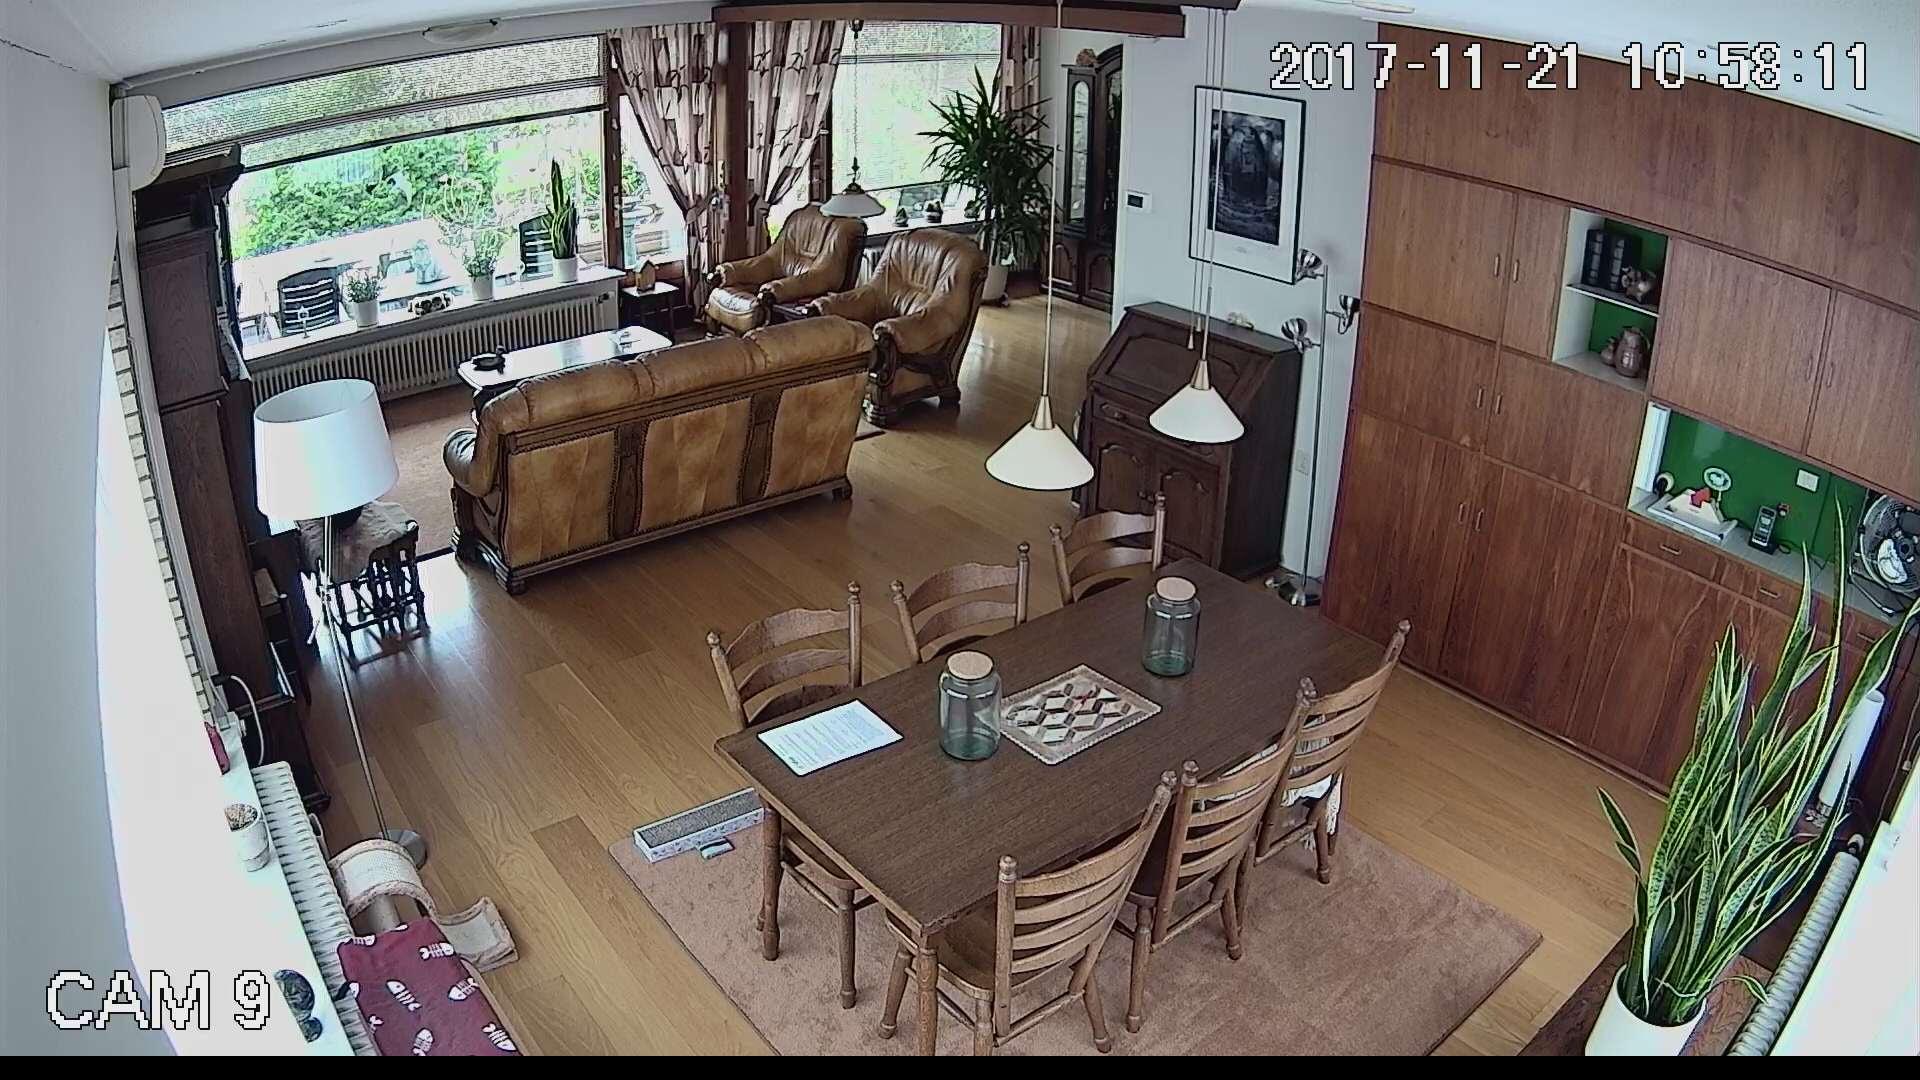 Huiskamer beeldkwalteit hdcvi 2mp